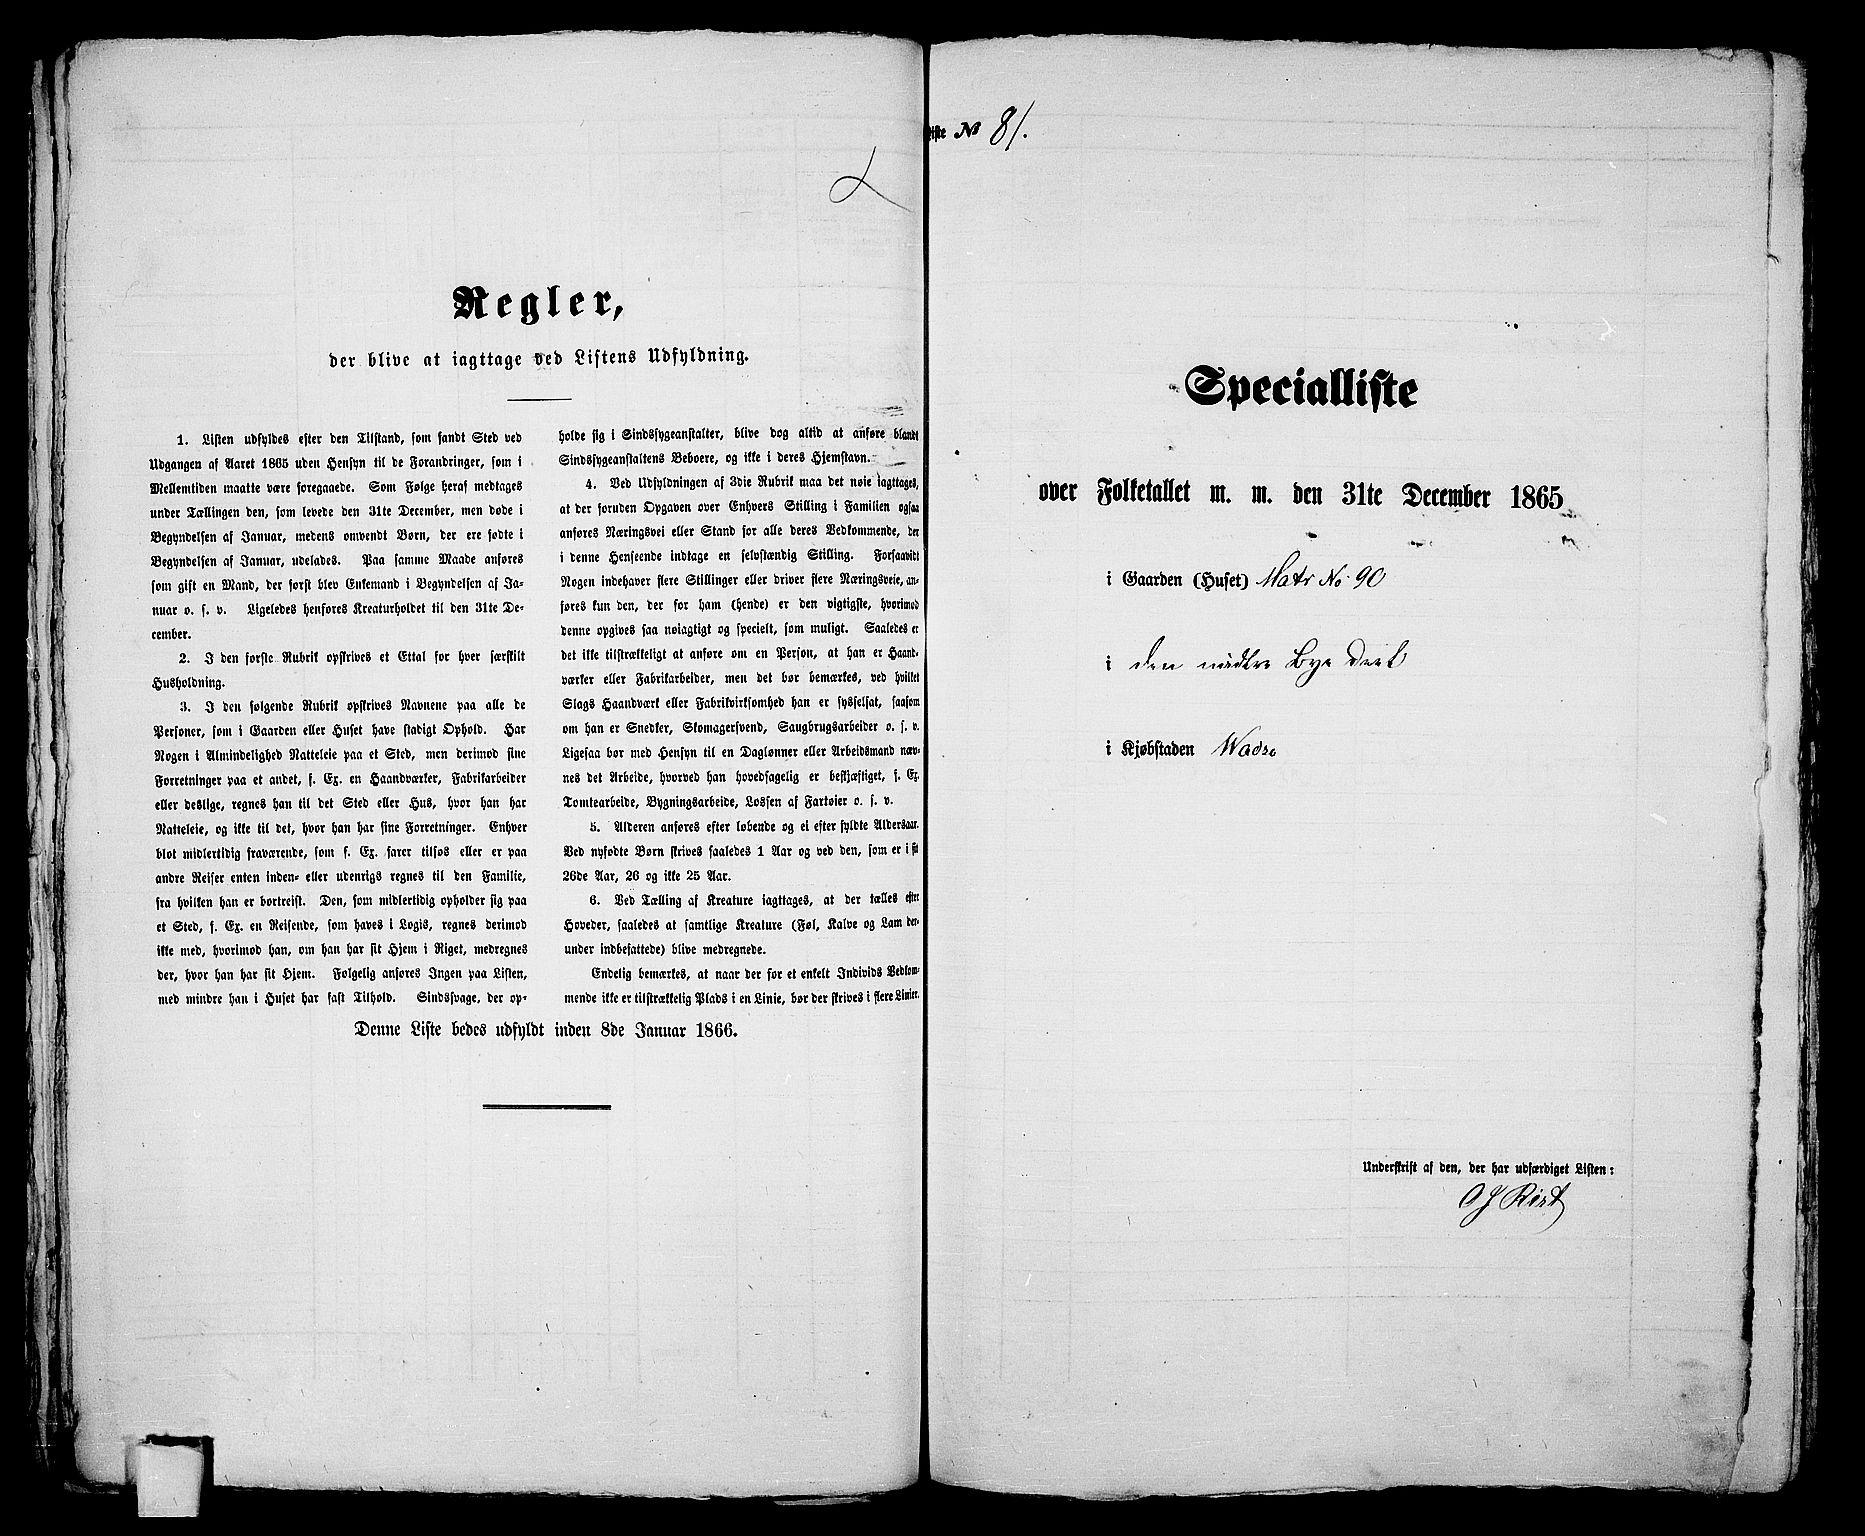 RA, 1865 census for Vadsø/Vadsø, 1865, p. 167